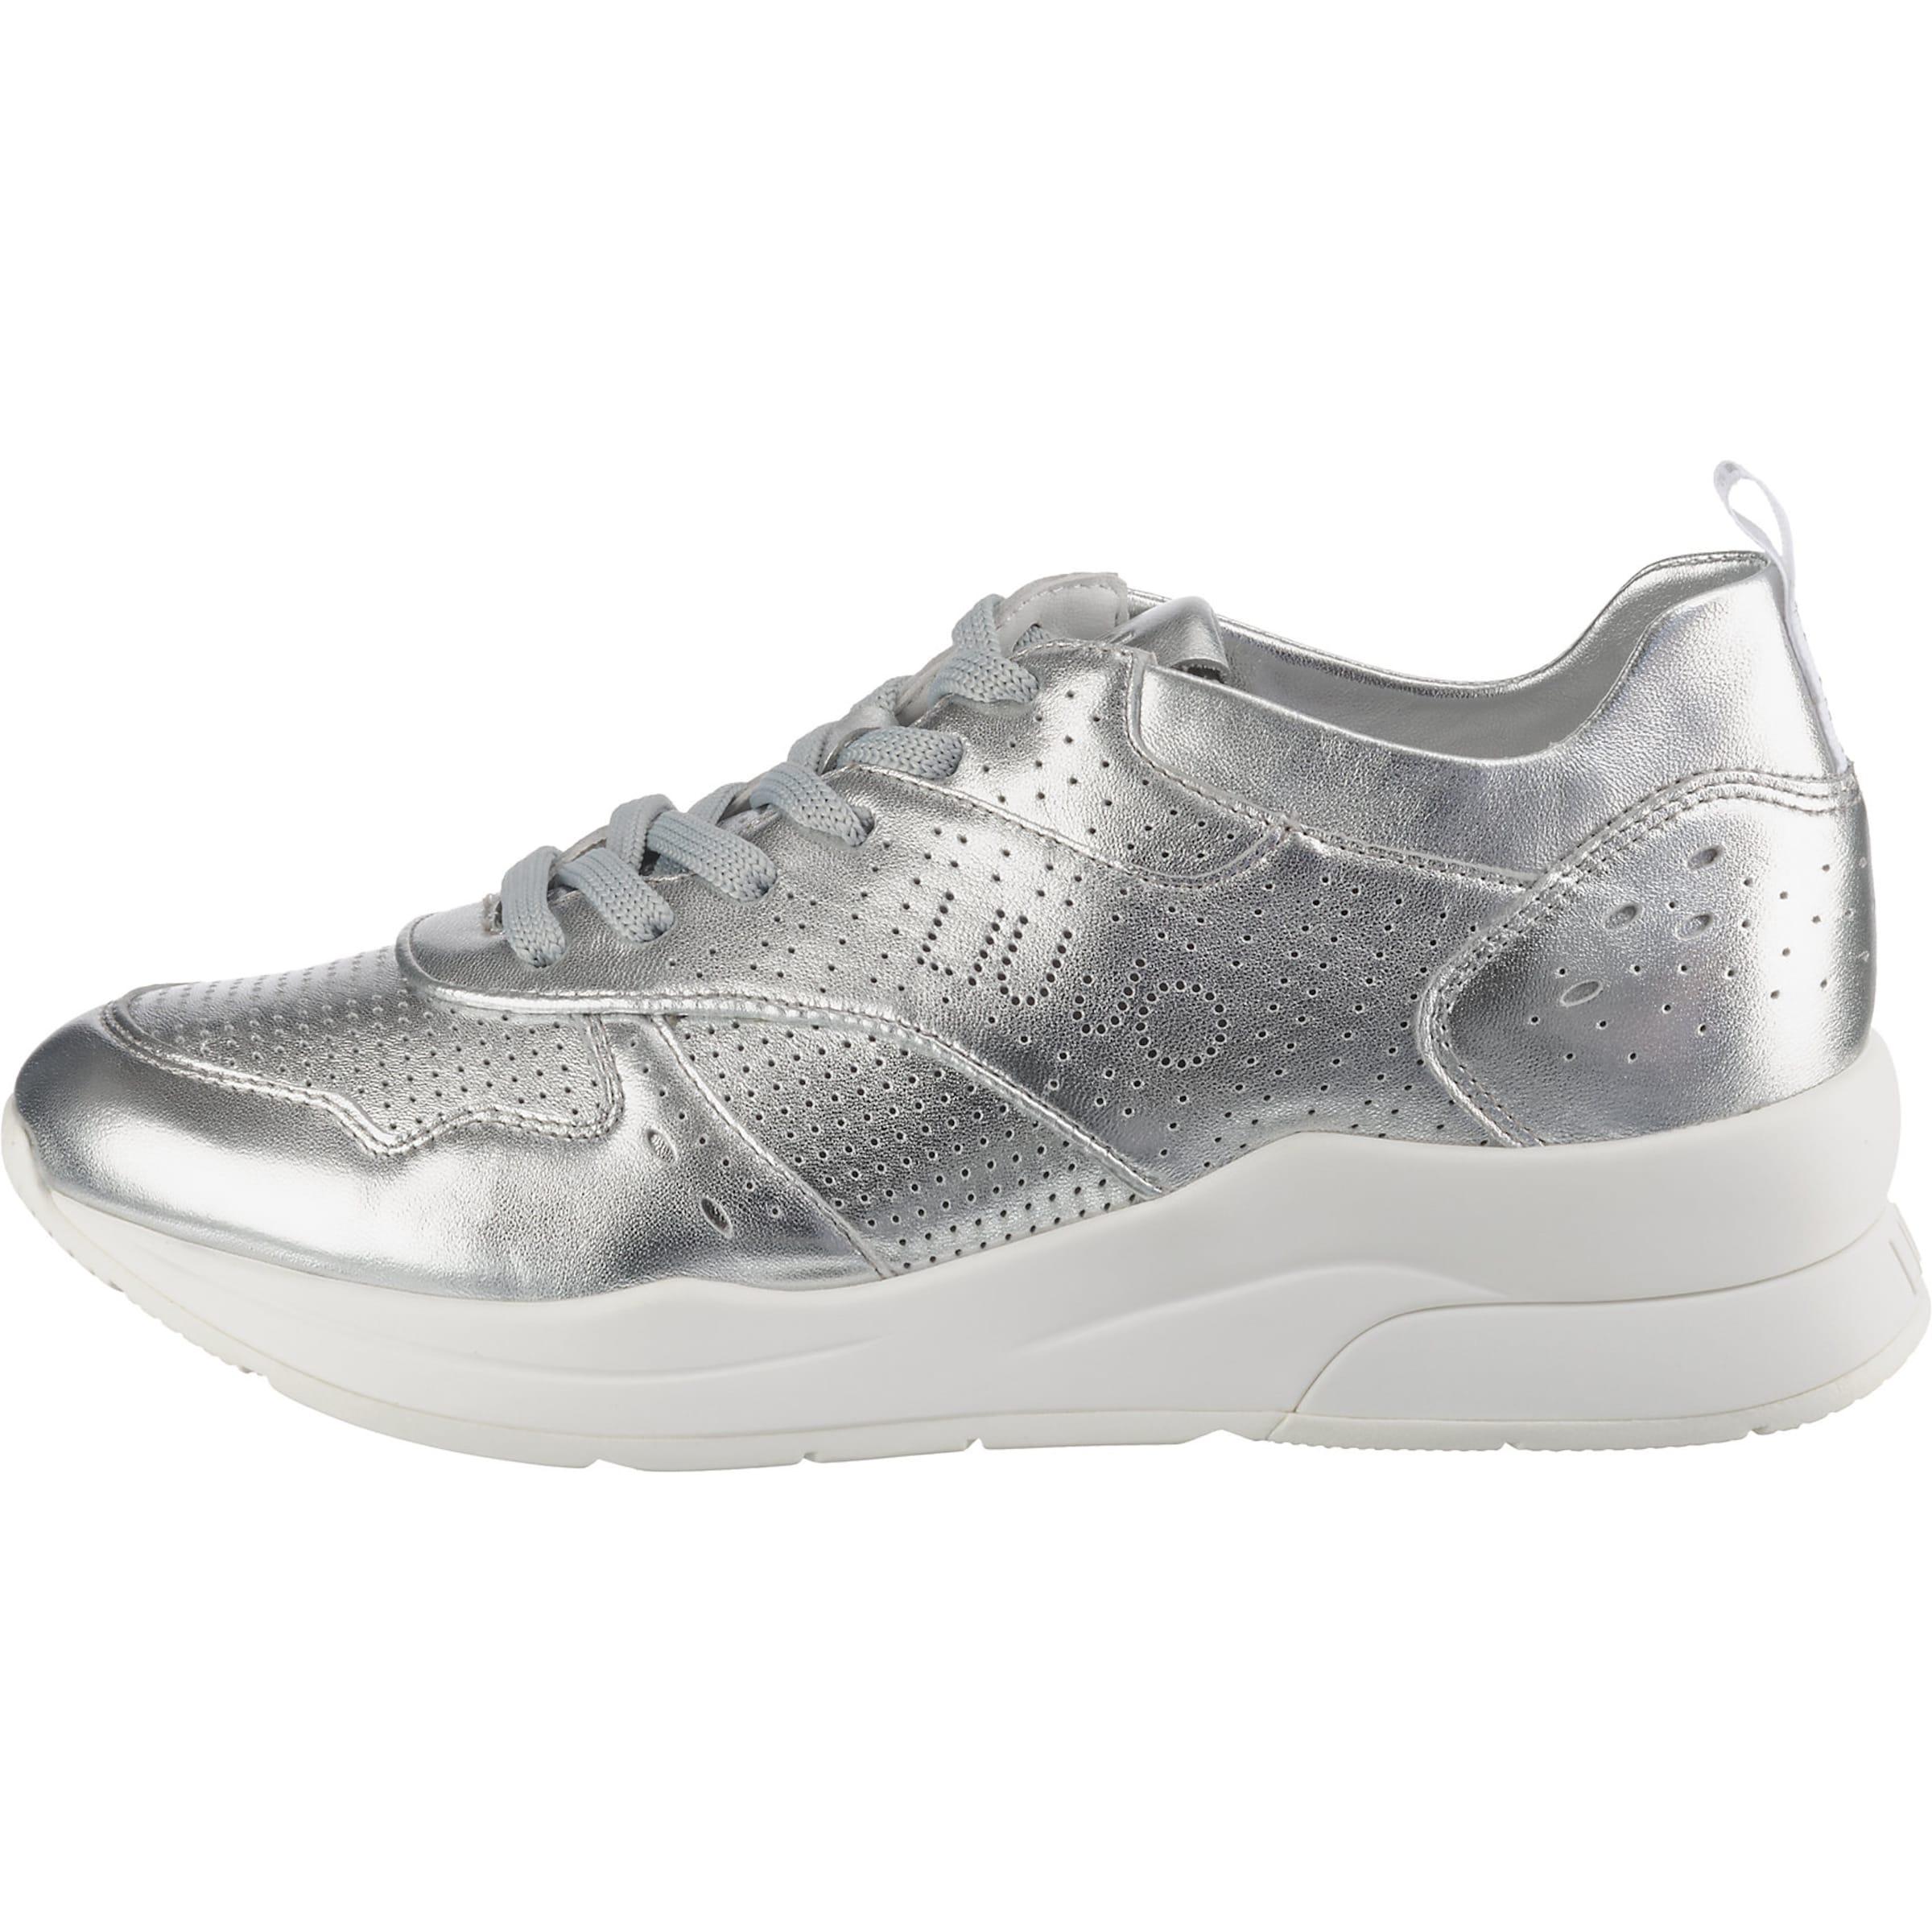 Liu In 'karlie' Sneakers Jo Silber PkXOiuTZ